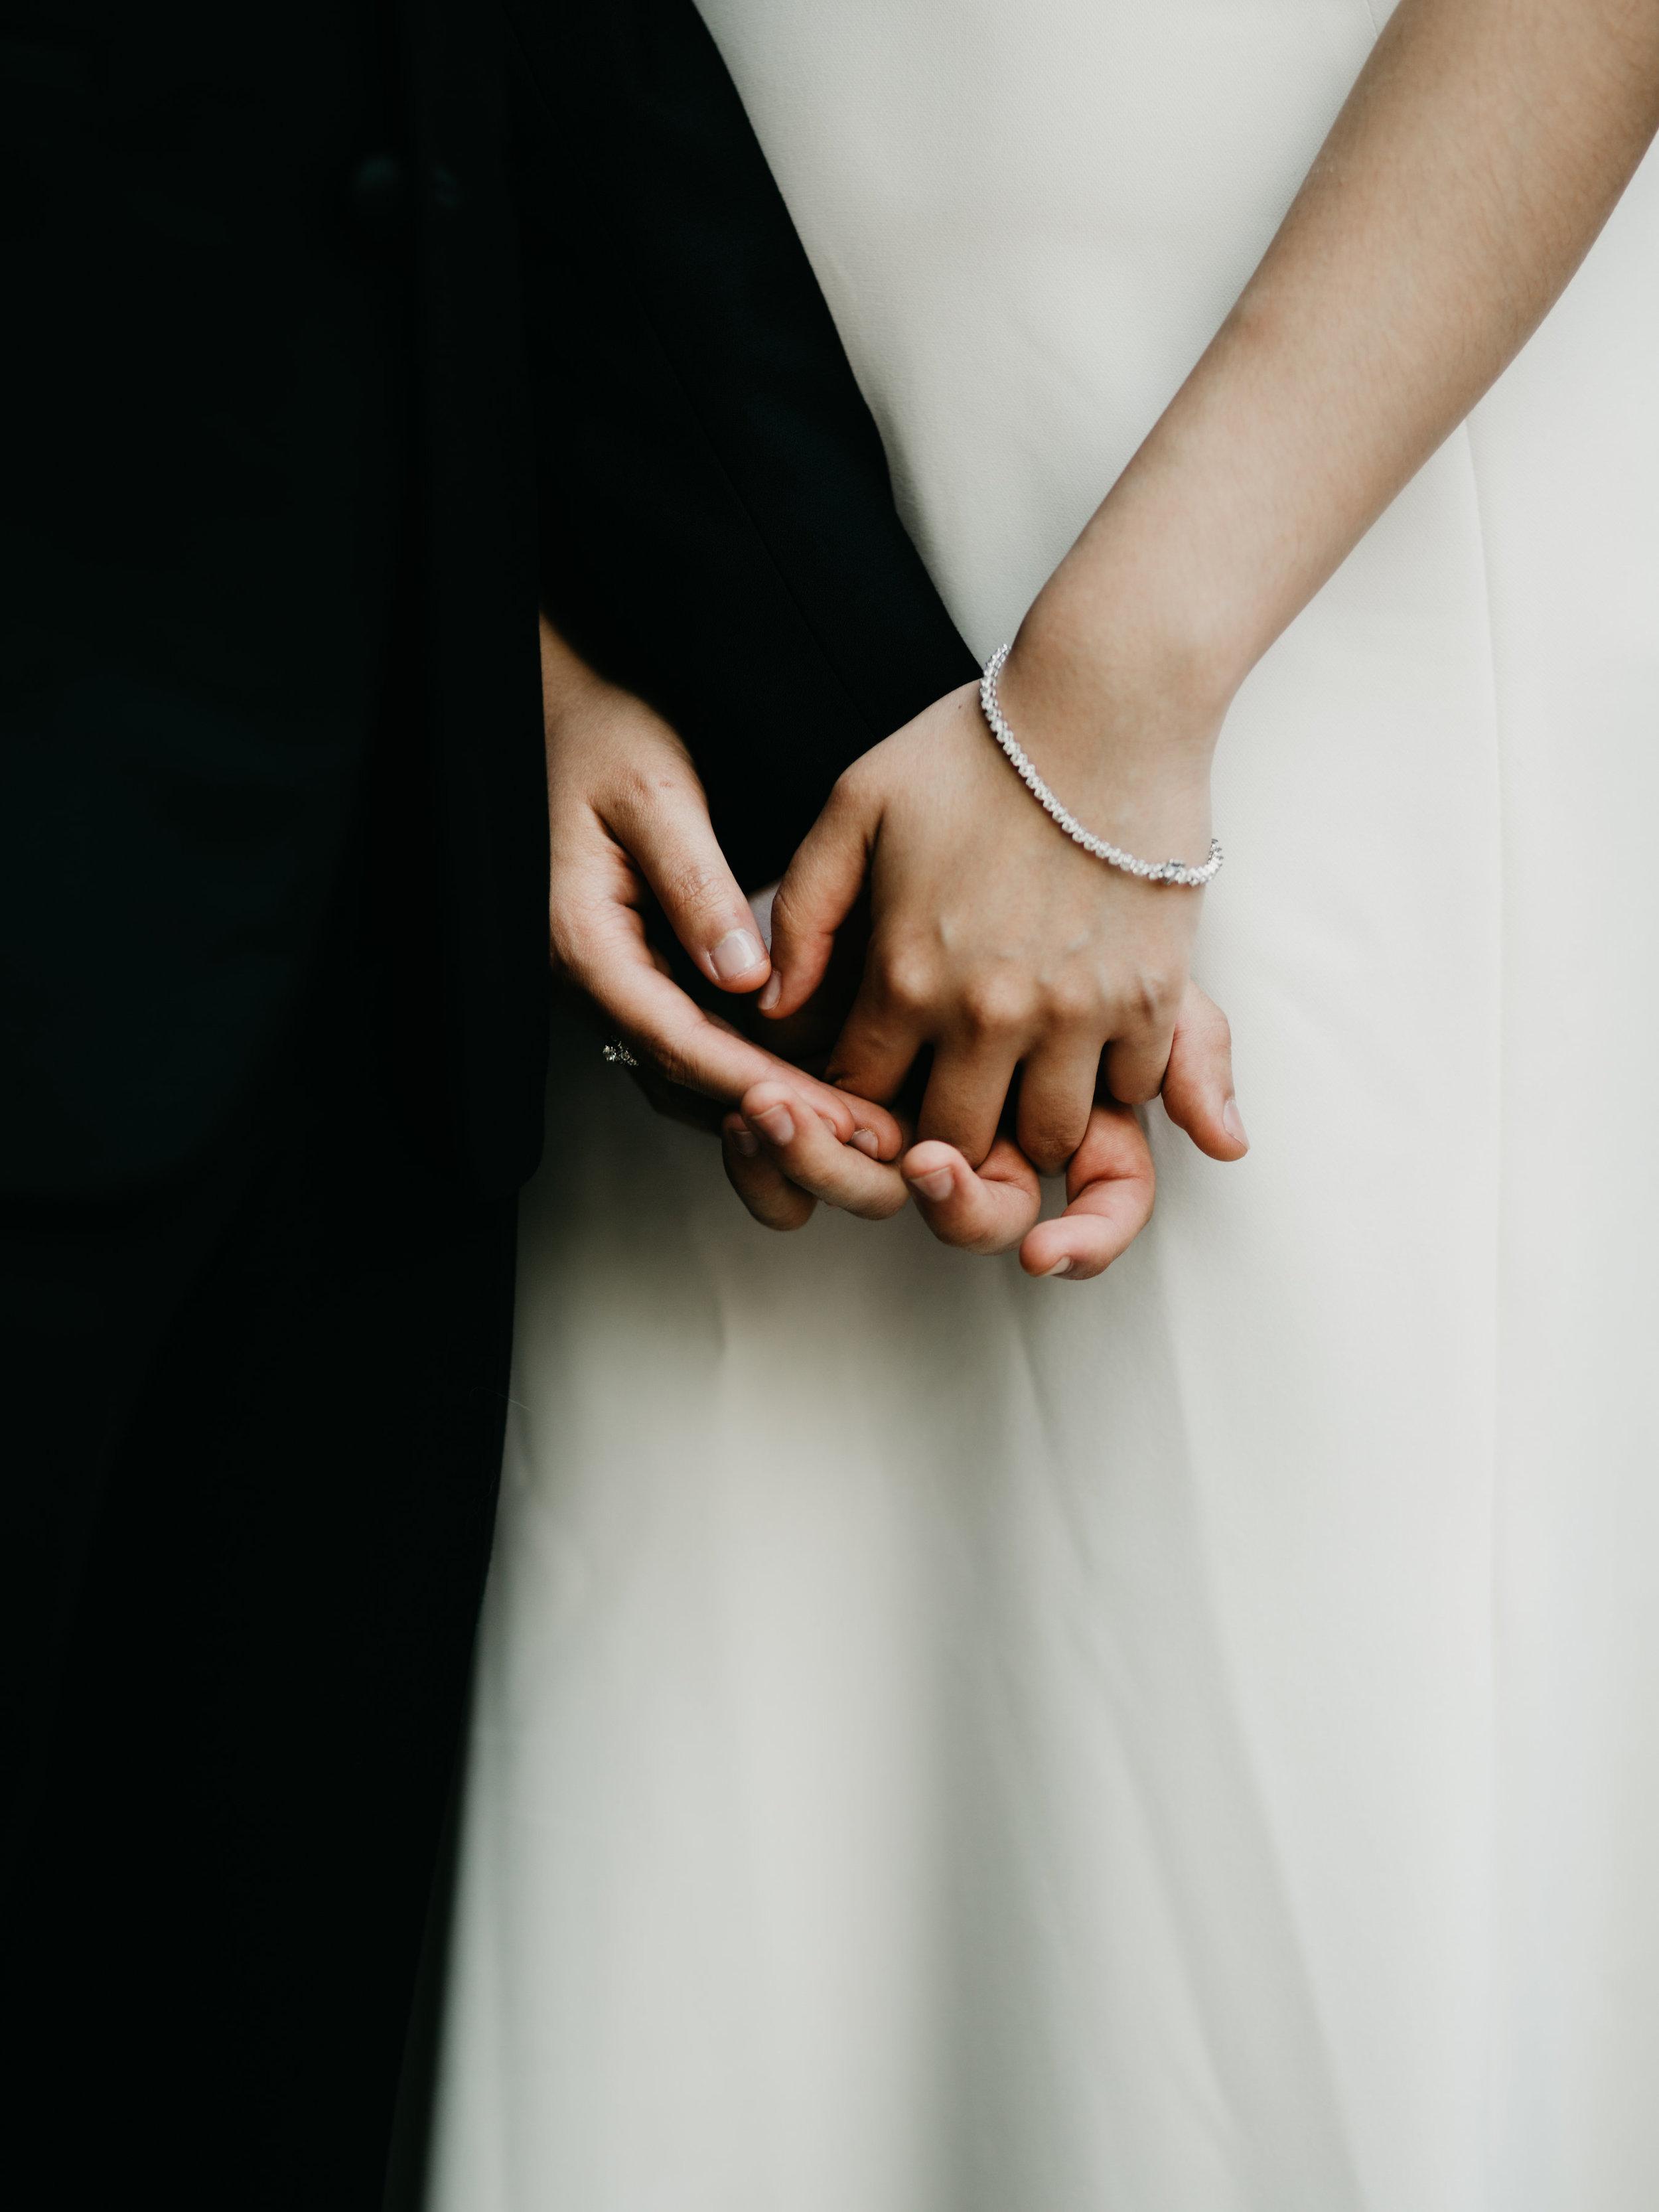 Millwick-wedding-planner9.jpg